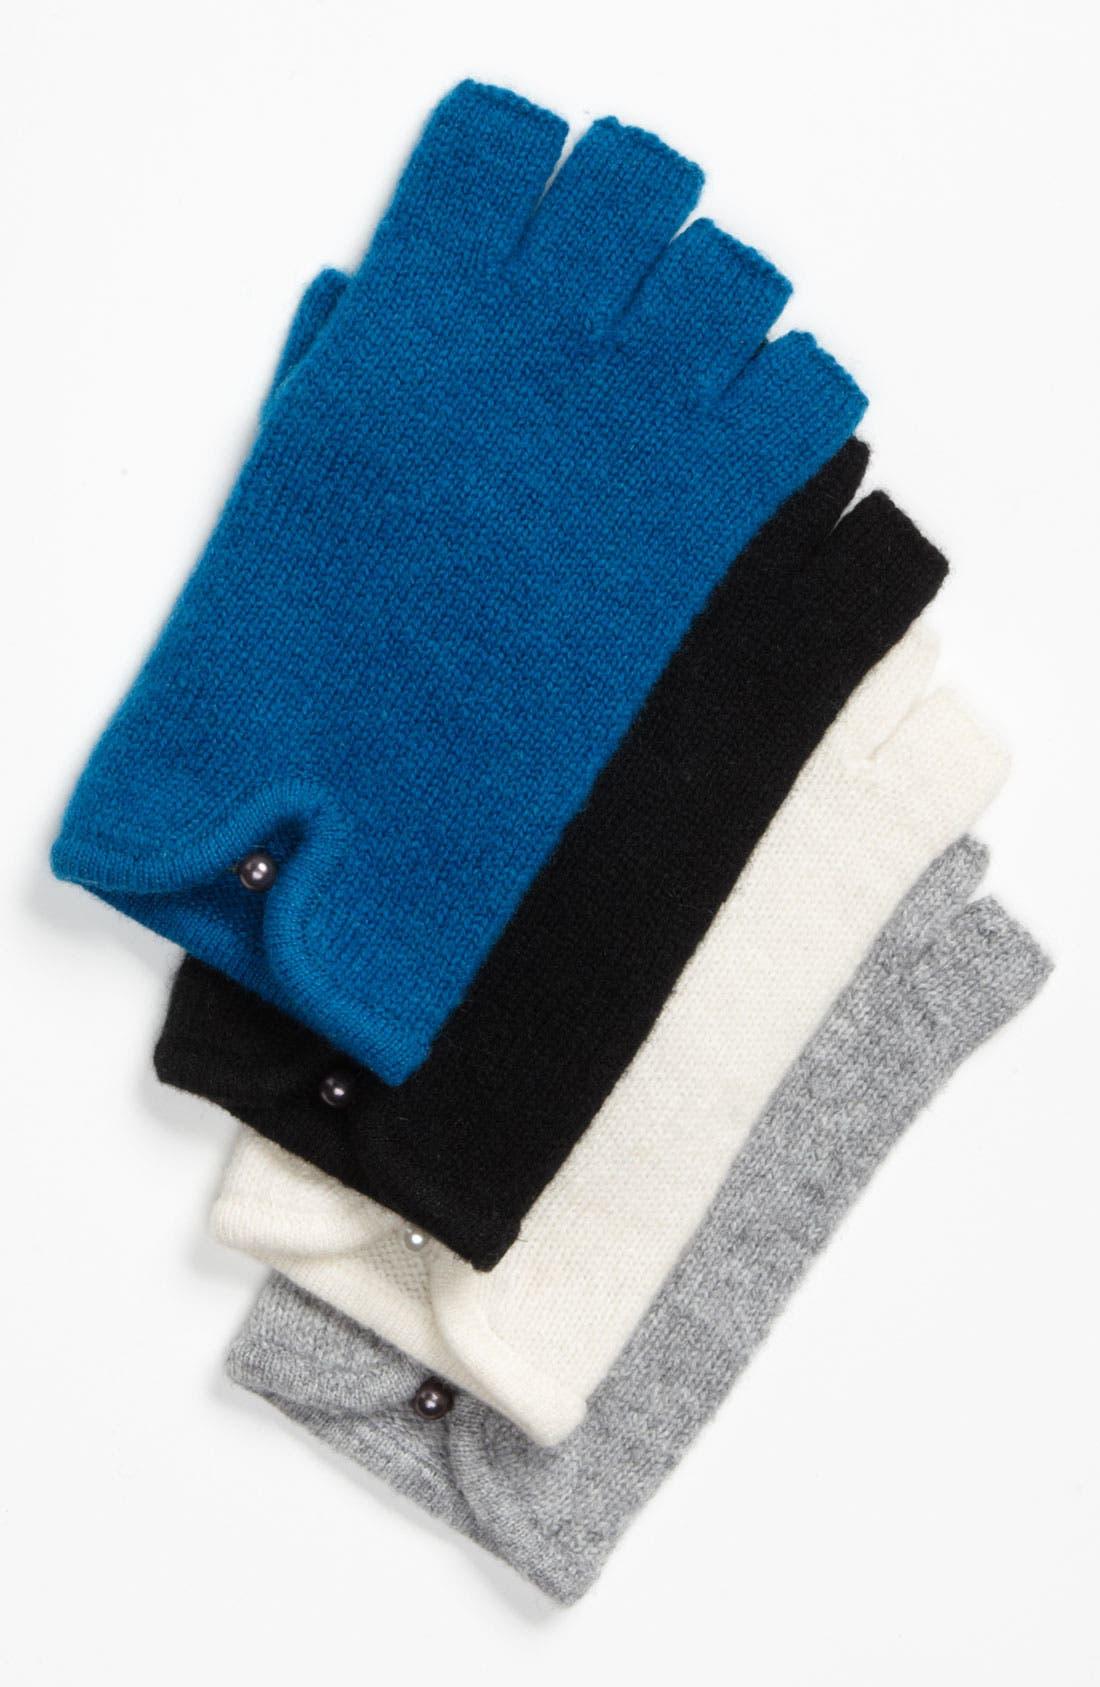 Main Image - Laundry by Shelli Segal Fingerless Wool Gloves